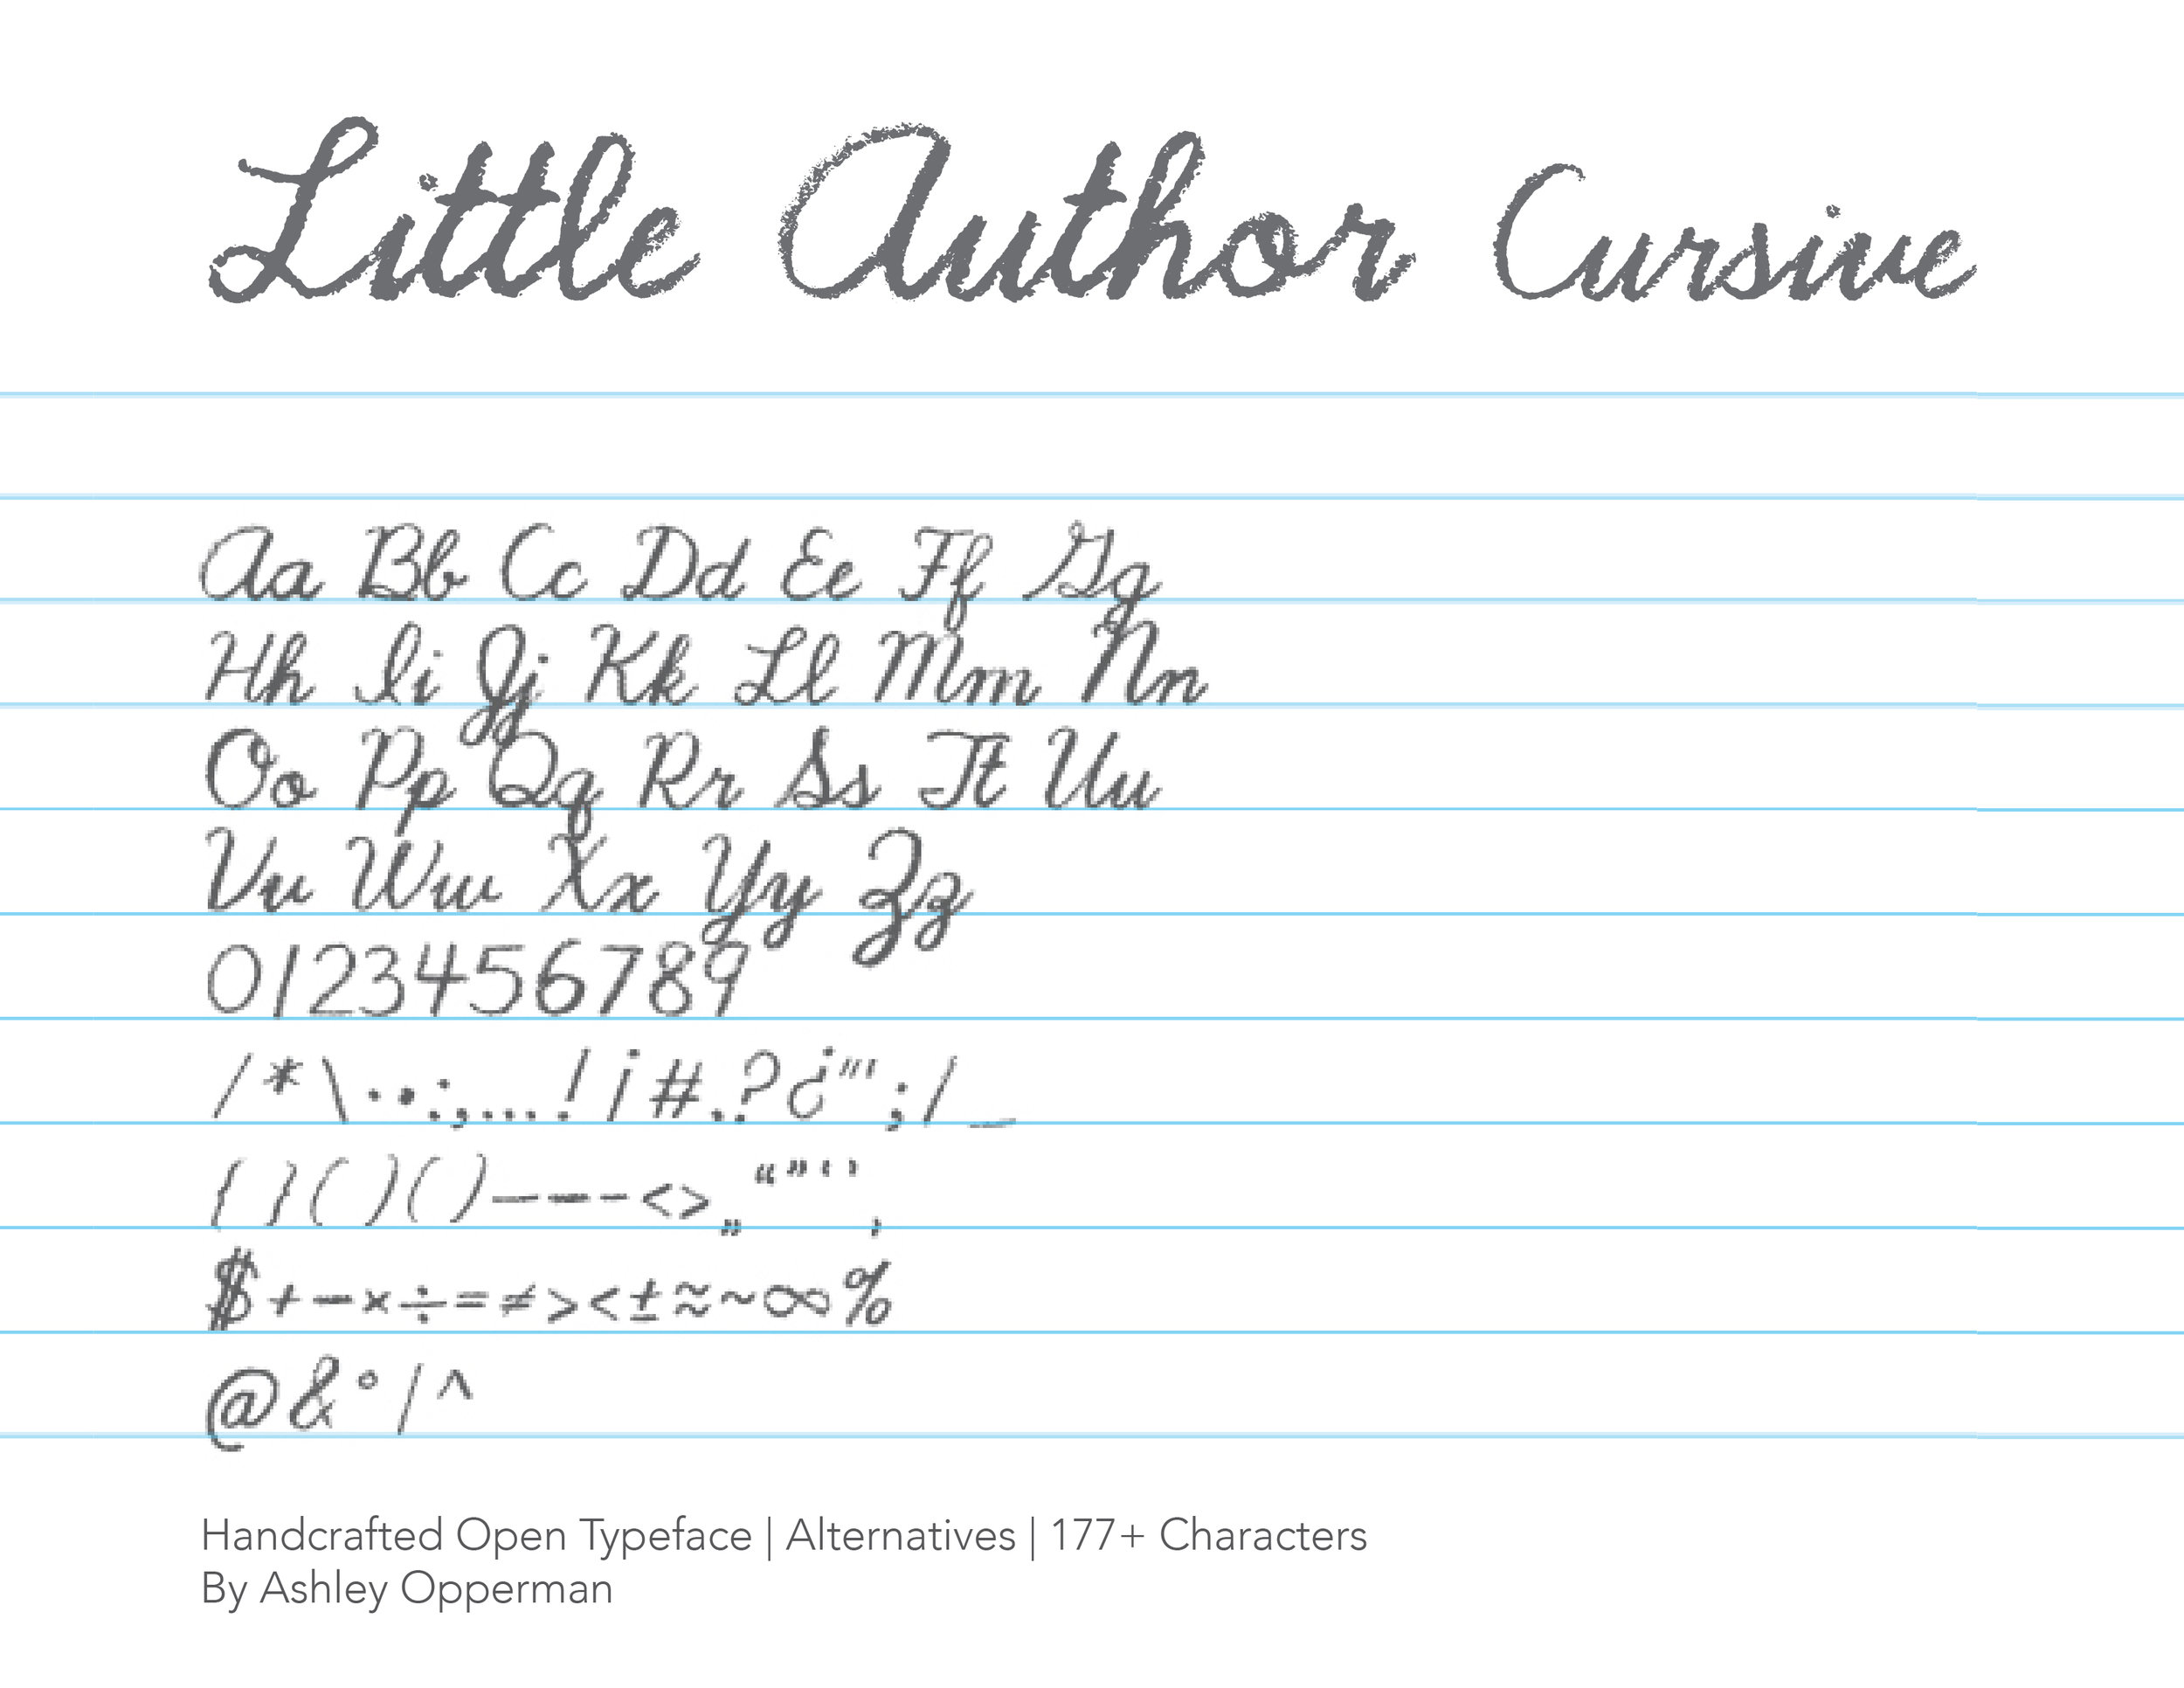 Author_Font-Oct2018-01.jpg